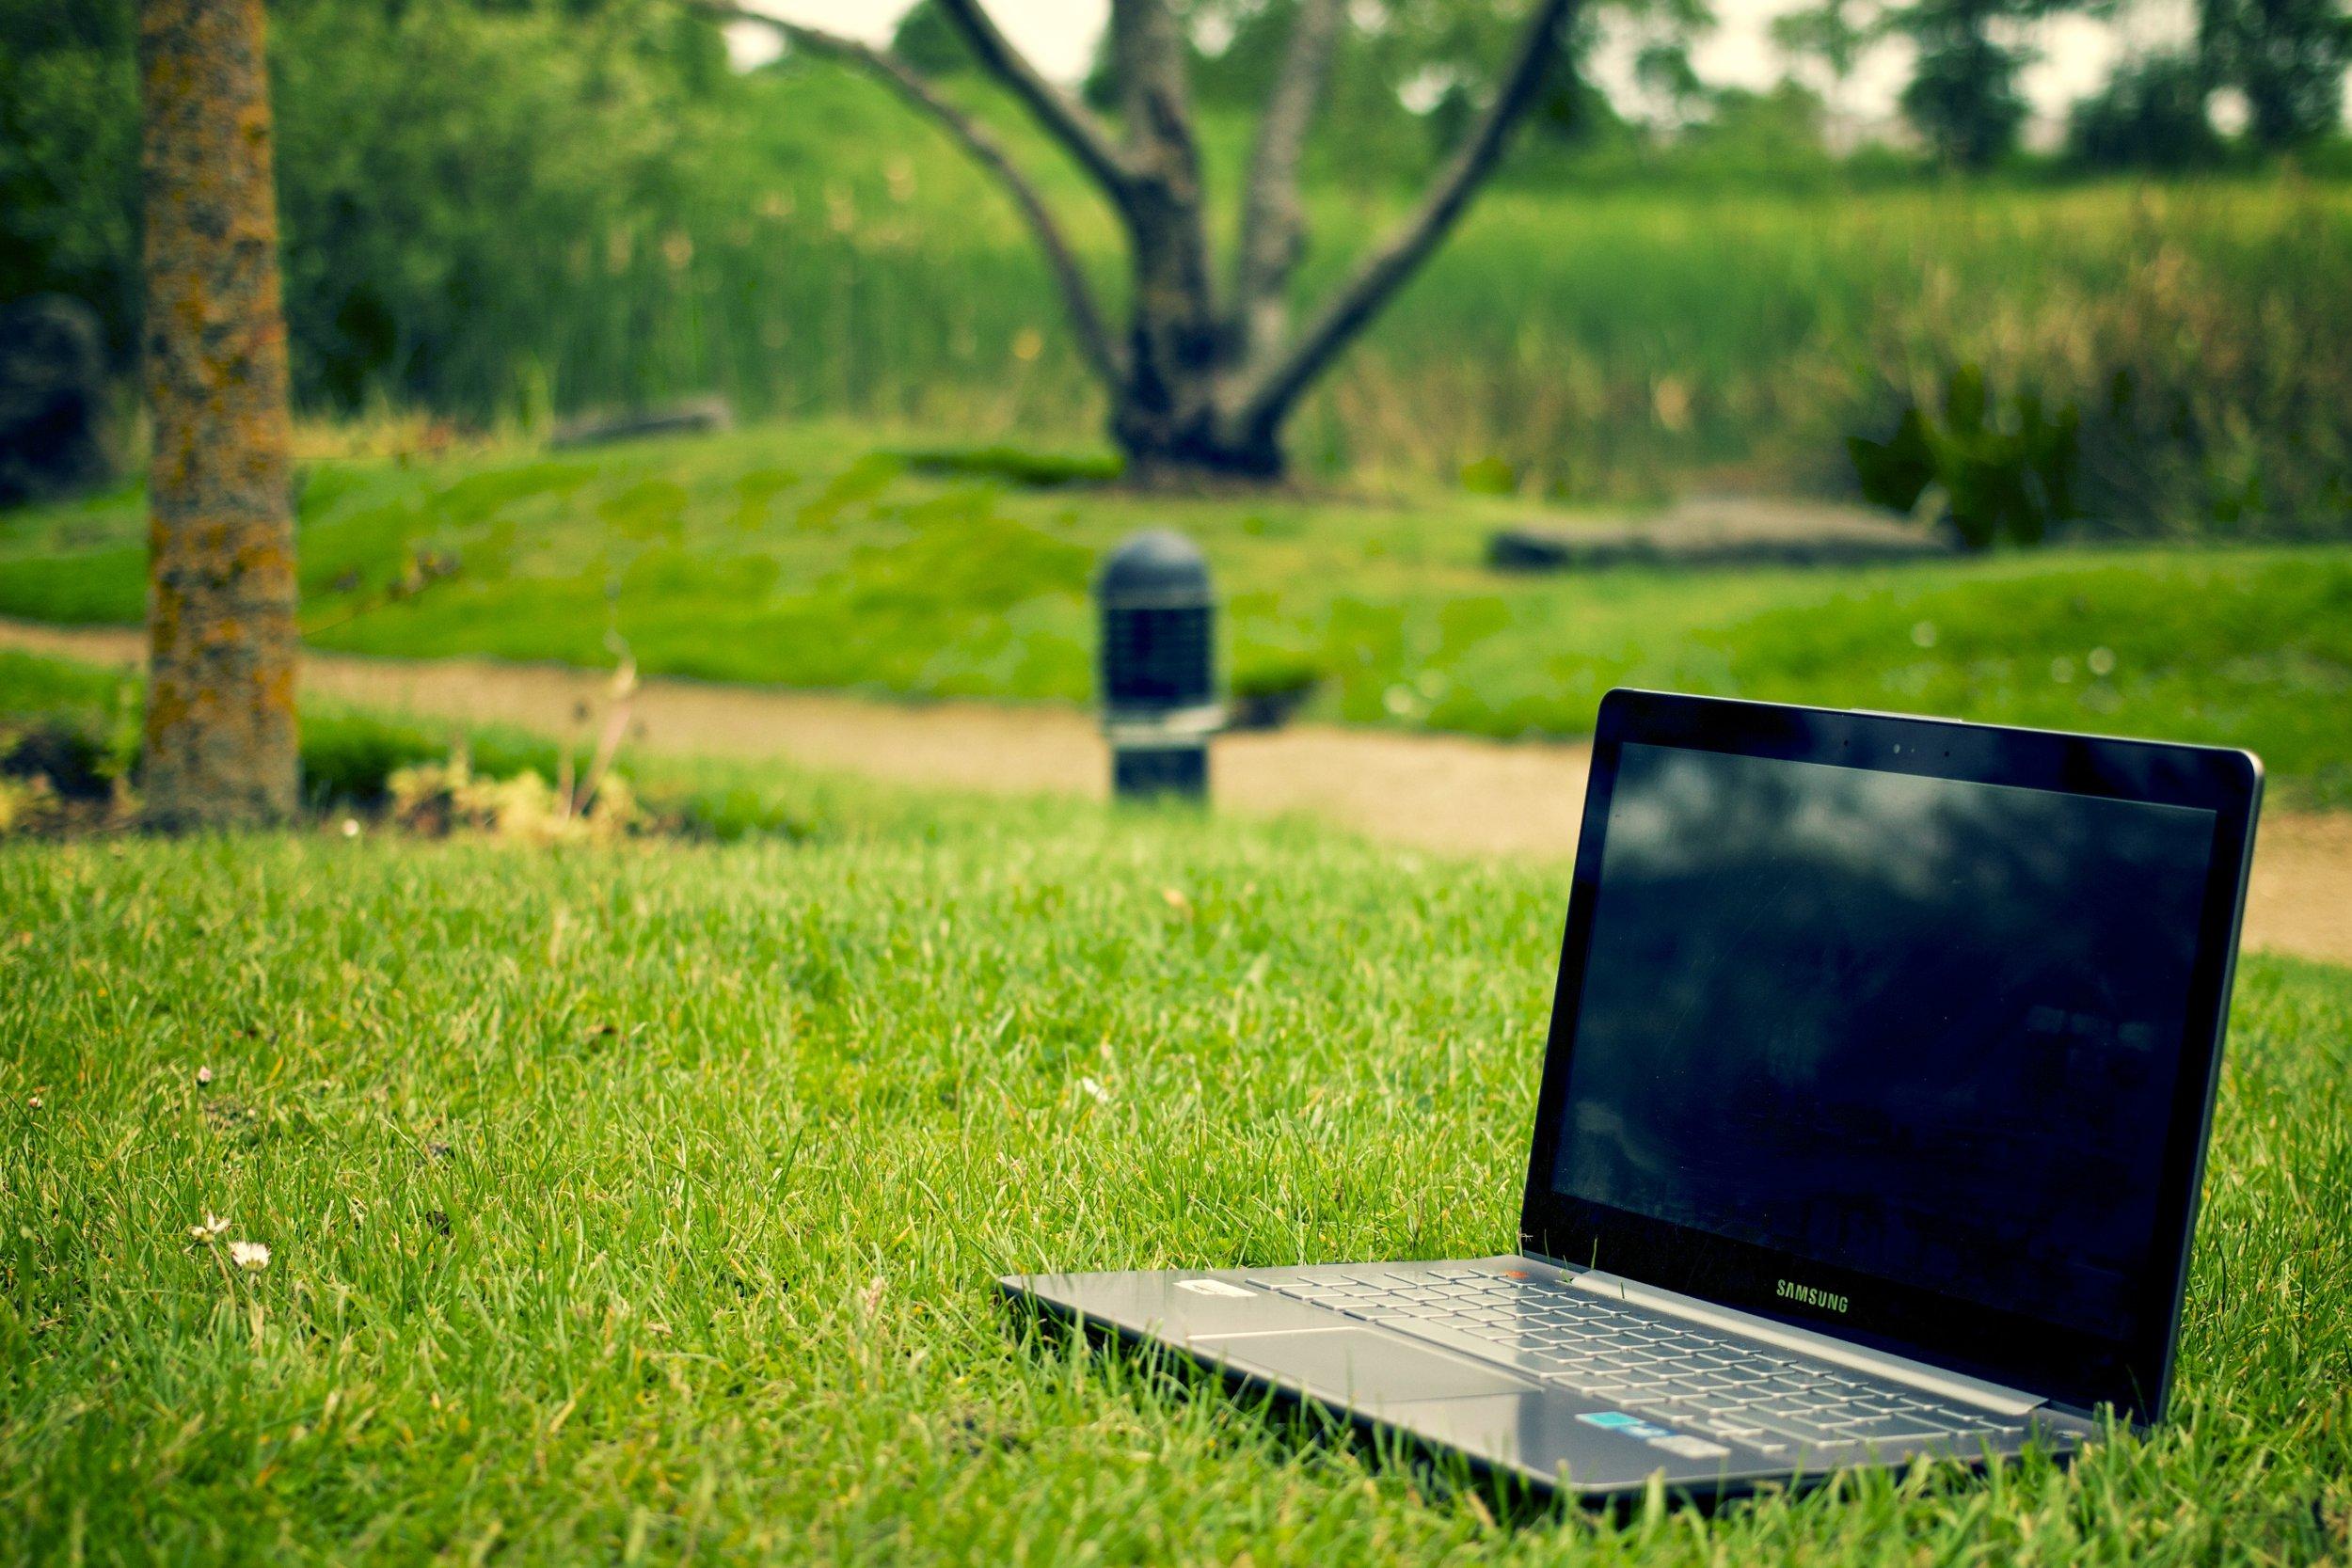 laptop-notebook-computer-work-tree-nature-949610-pxhere.com.jpg